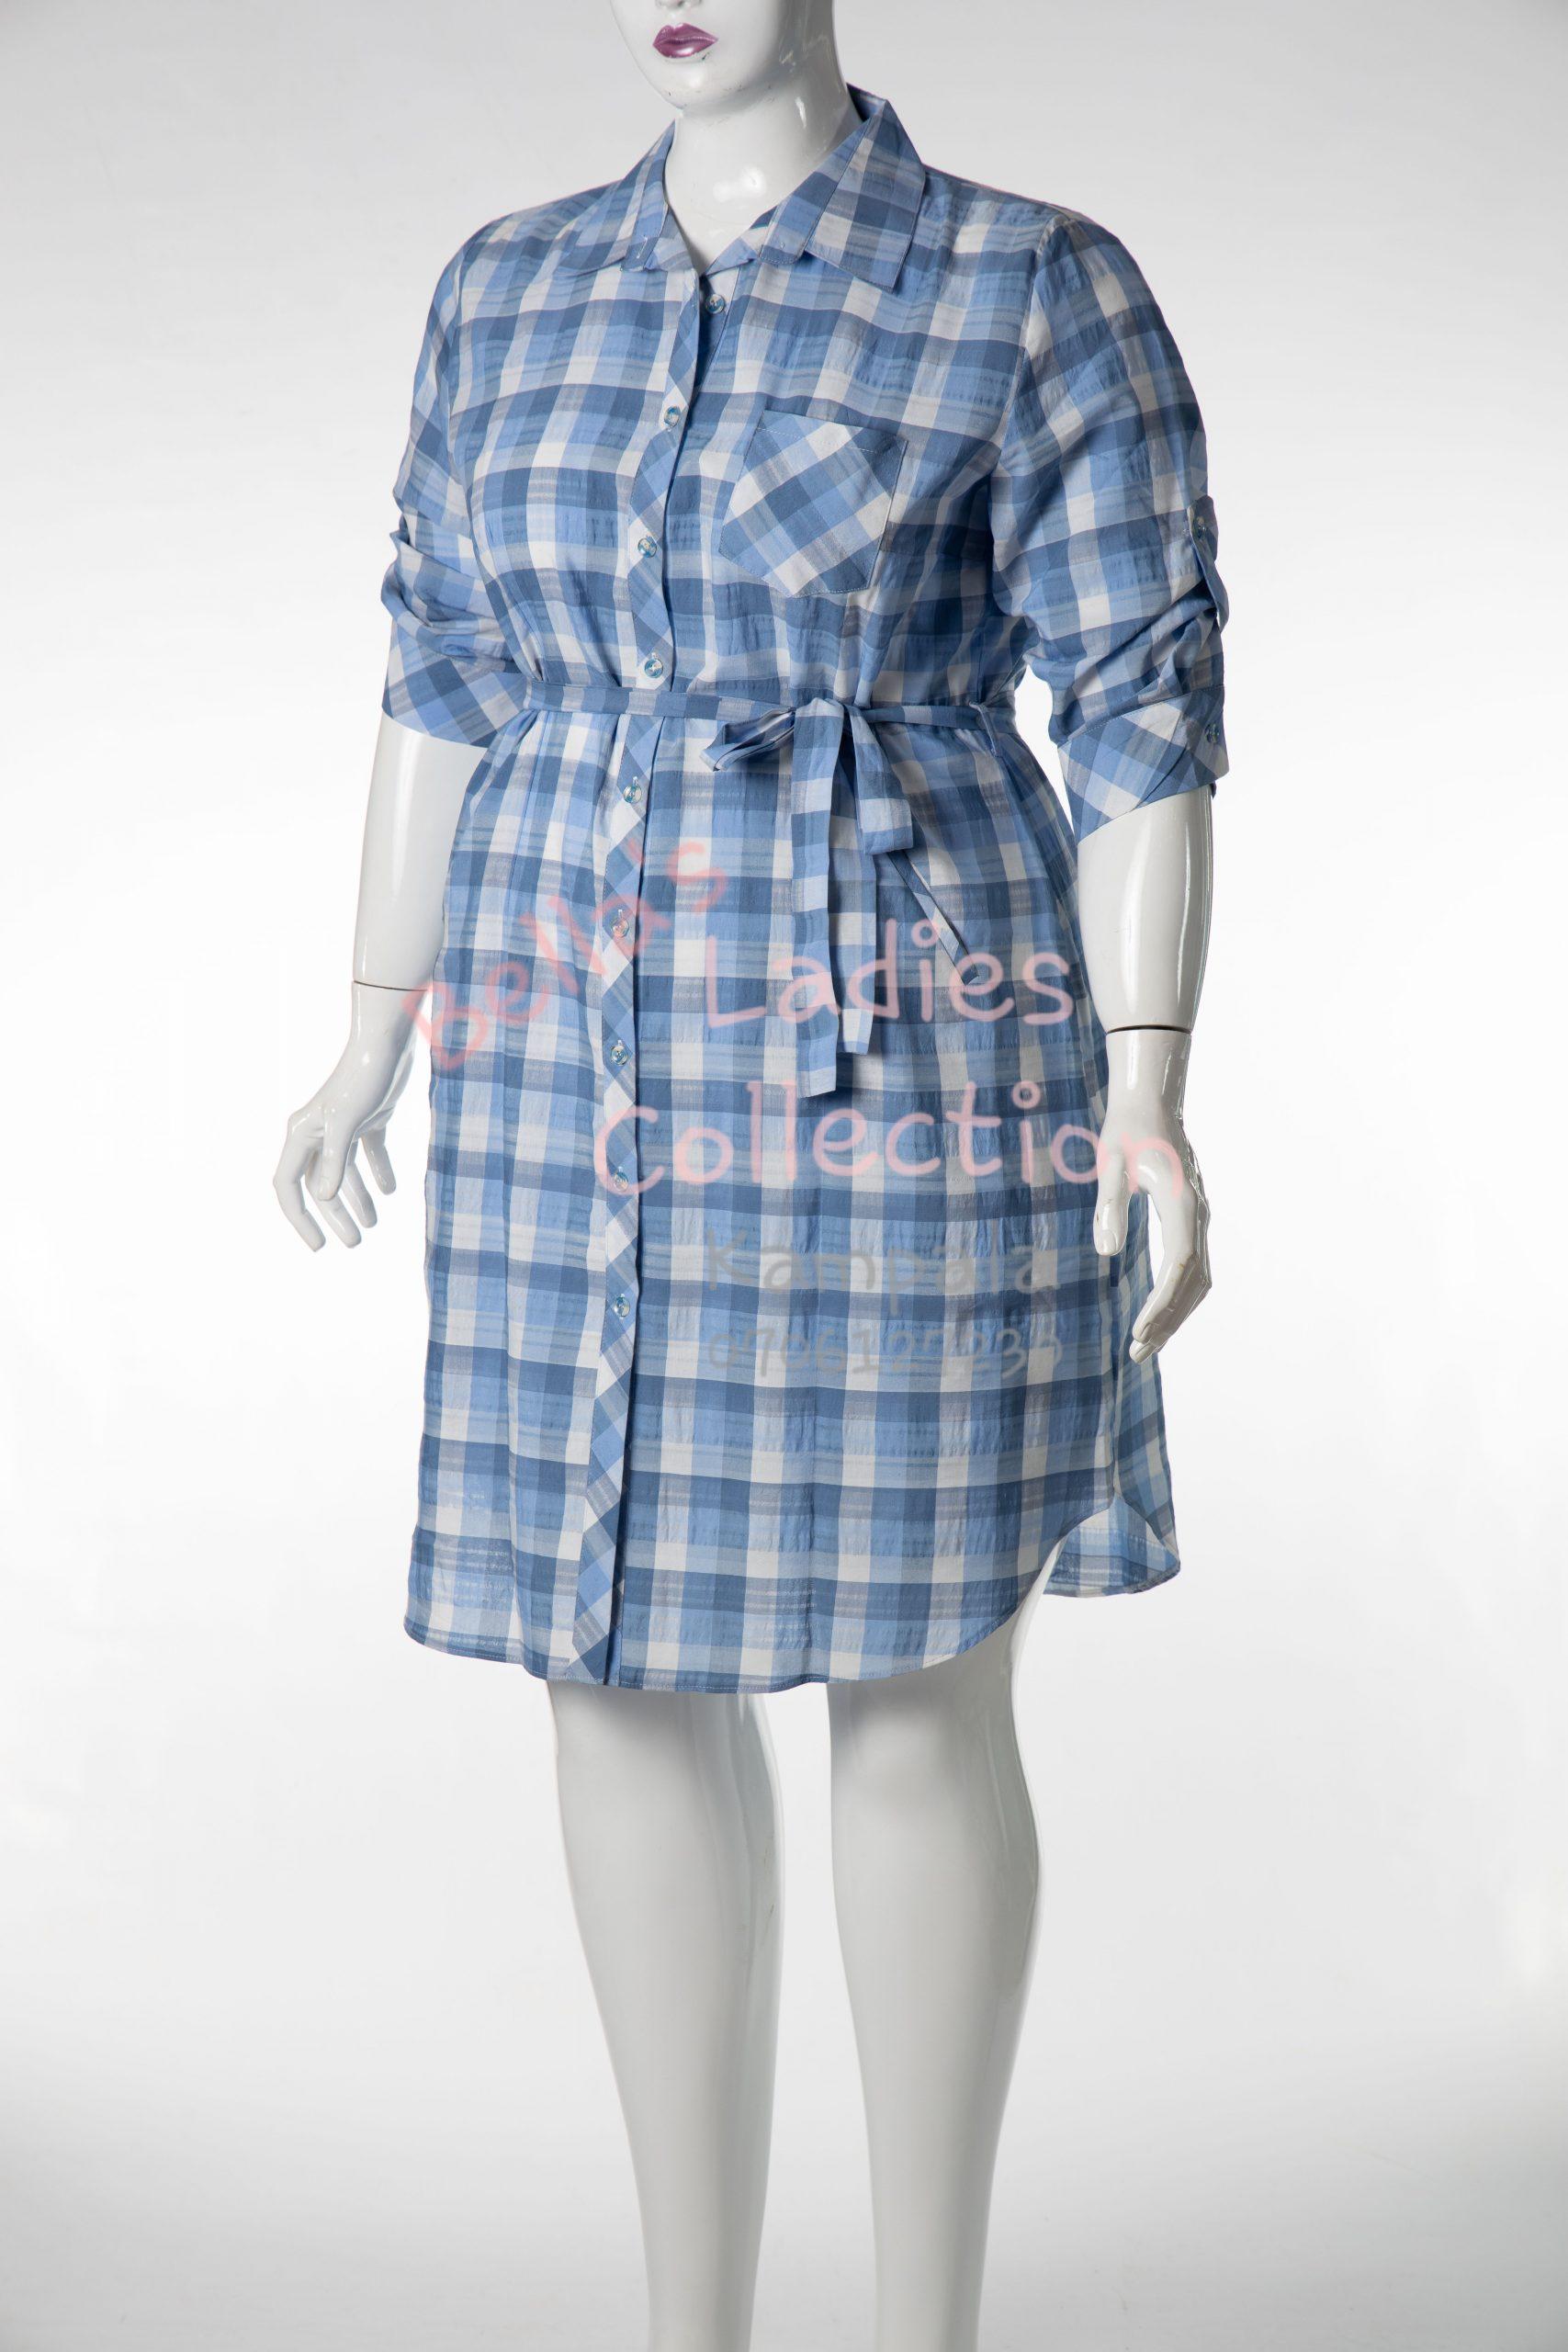 Dress Tops